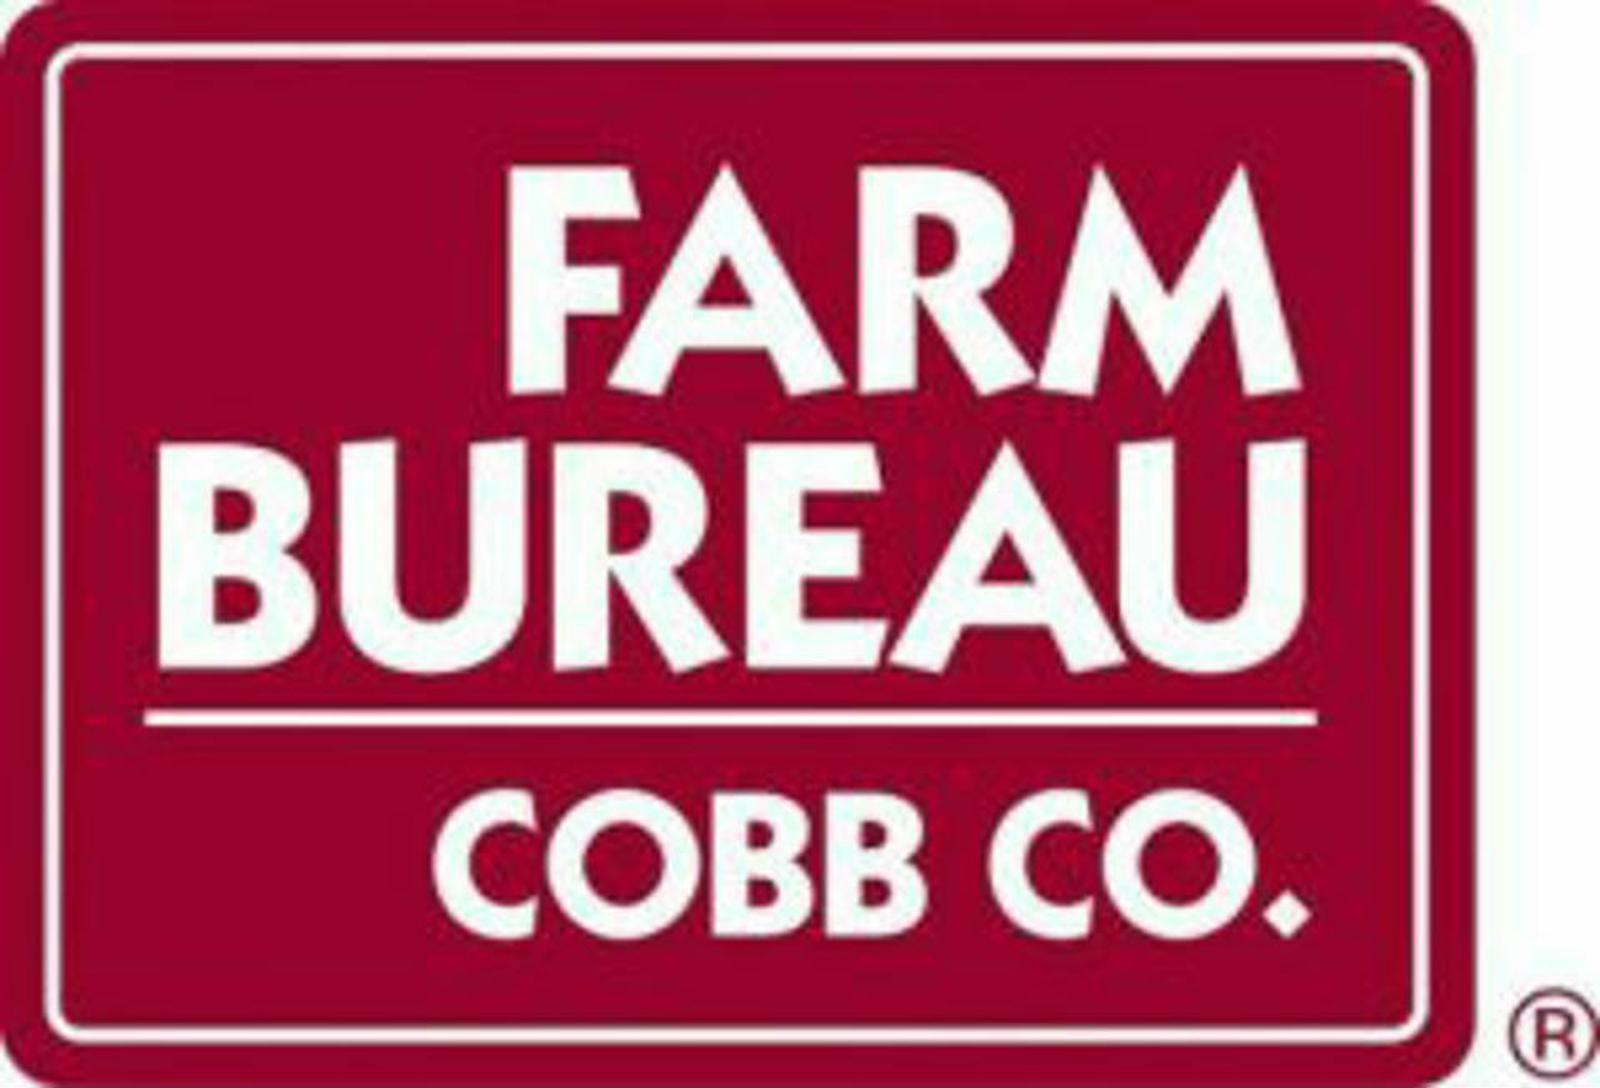 Cobb County Farm Bureau